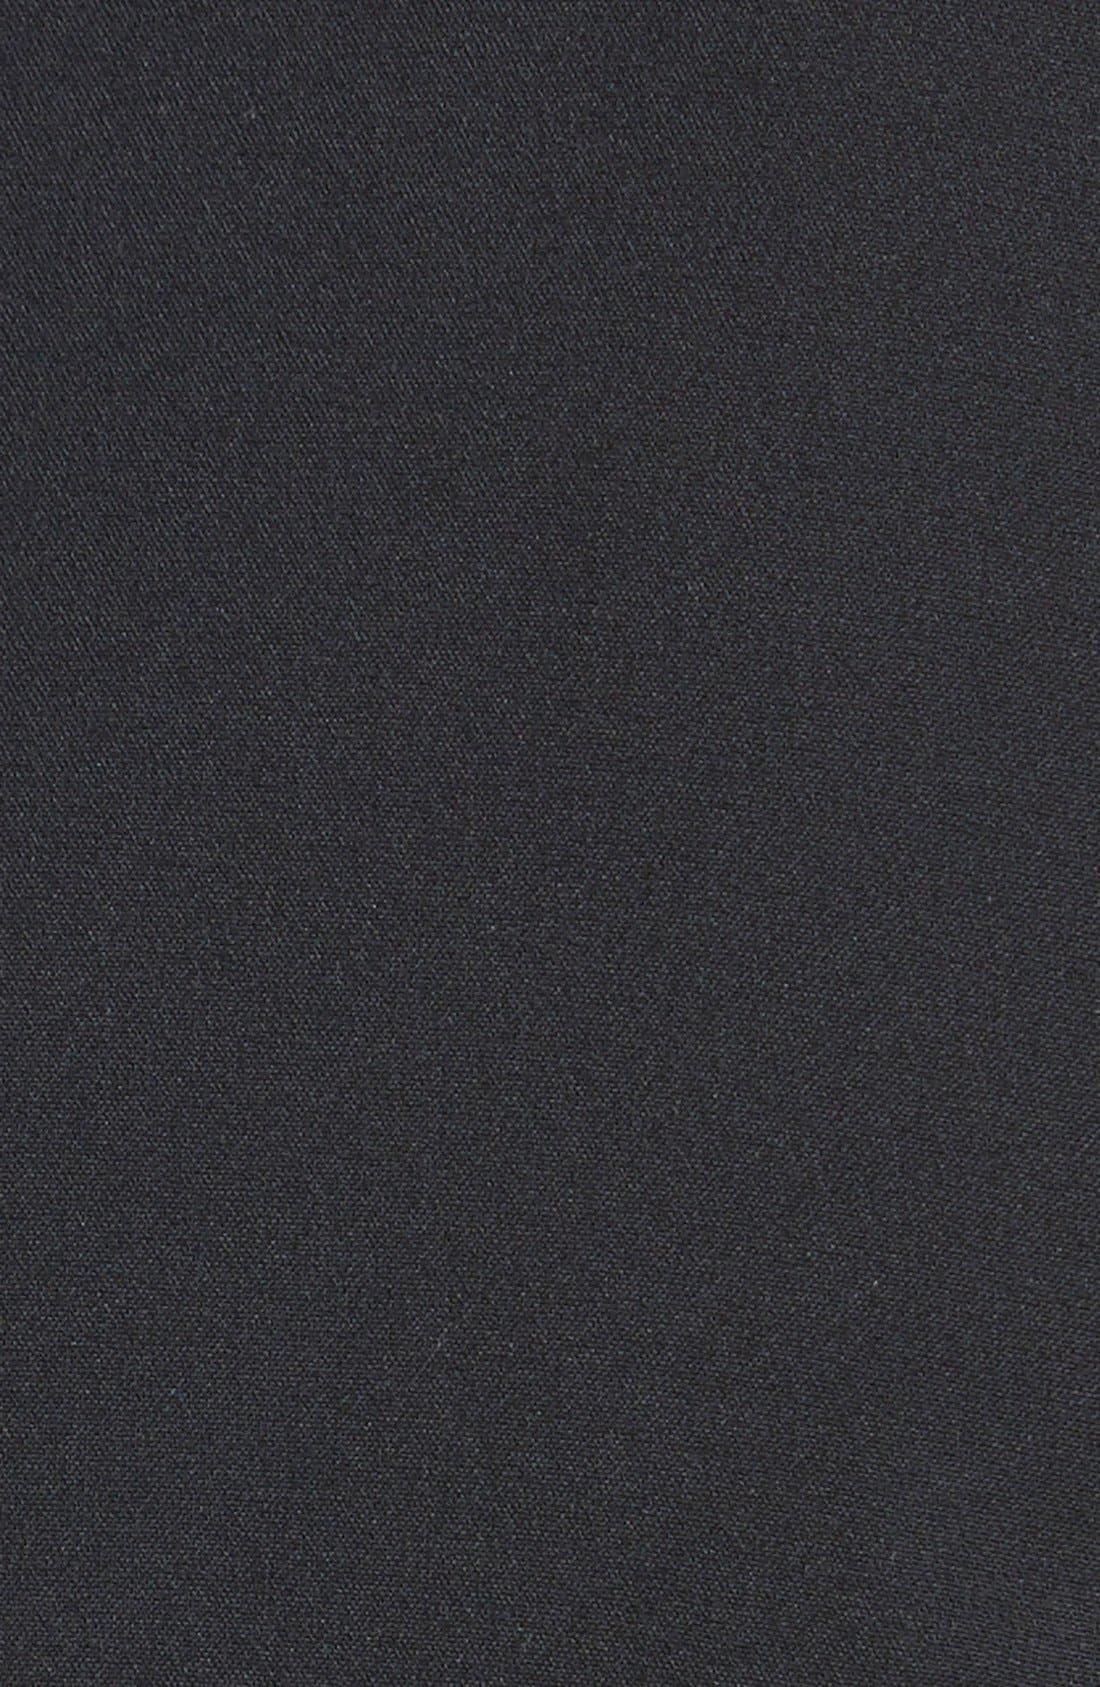 Alternate Image 3  - Calvin Klein Side Ruched Sheath Dress (Plus Size)